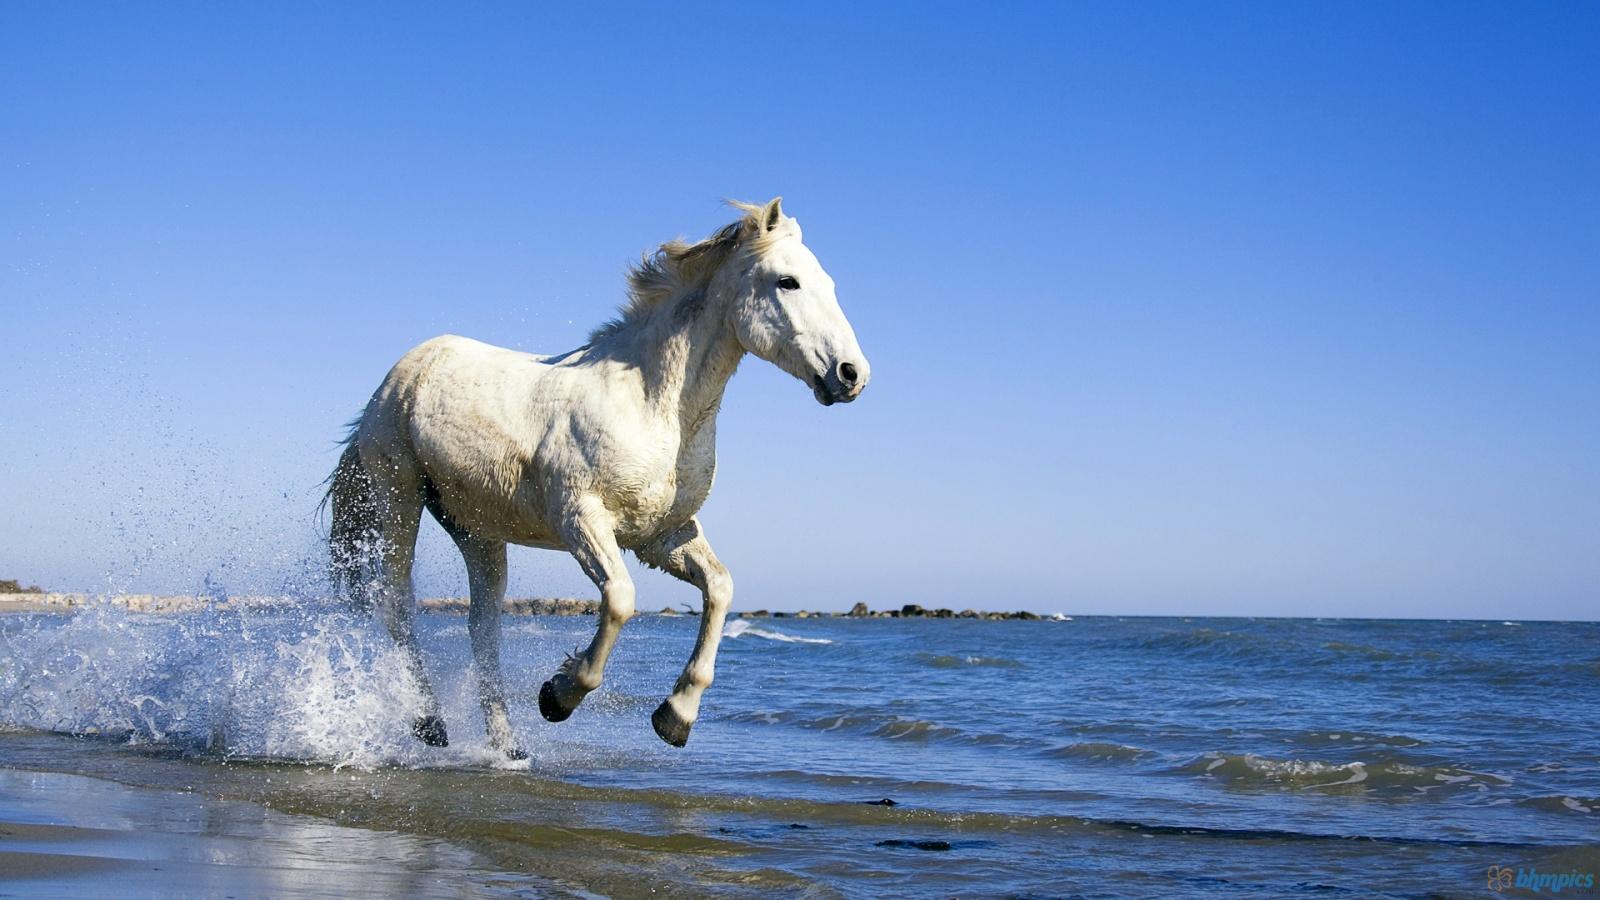 Fantastic   Wallpaper Horse Beauty - White+Horse+Wallpapers+20  HD_161578.jpg